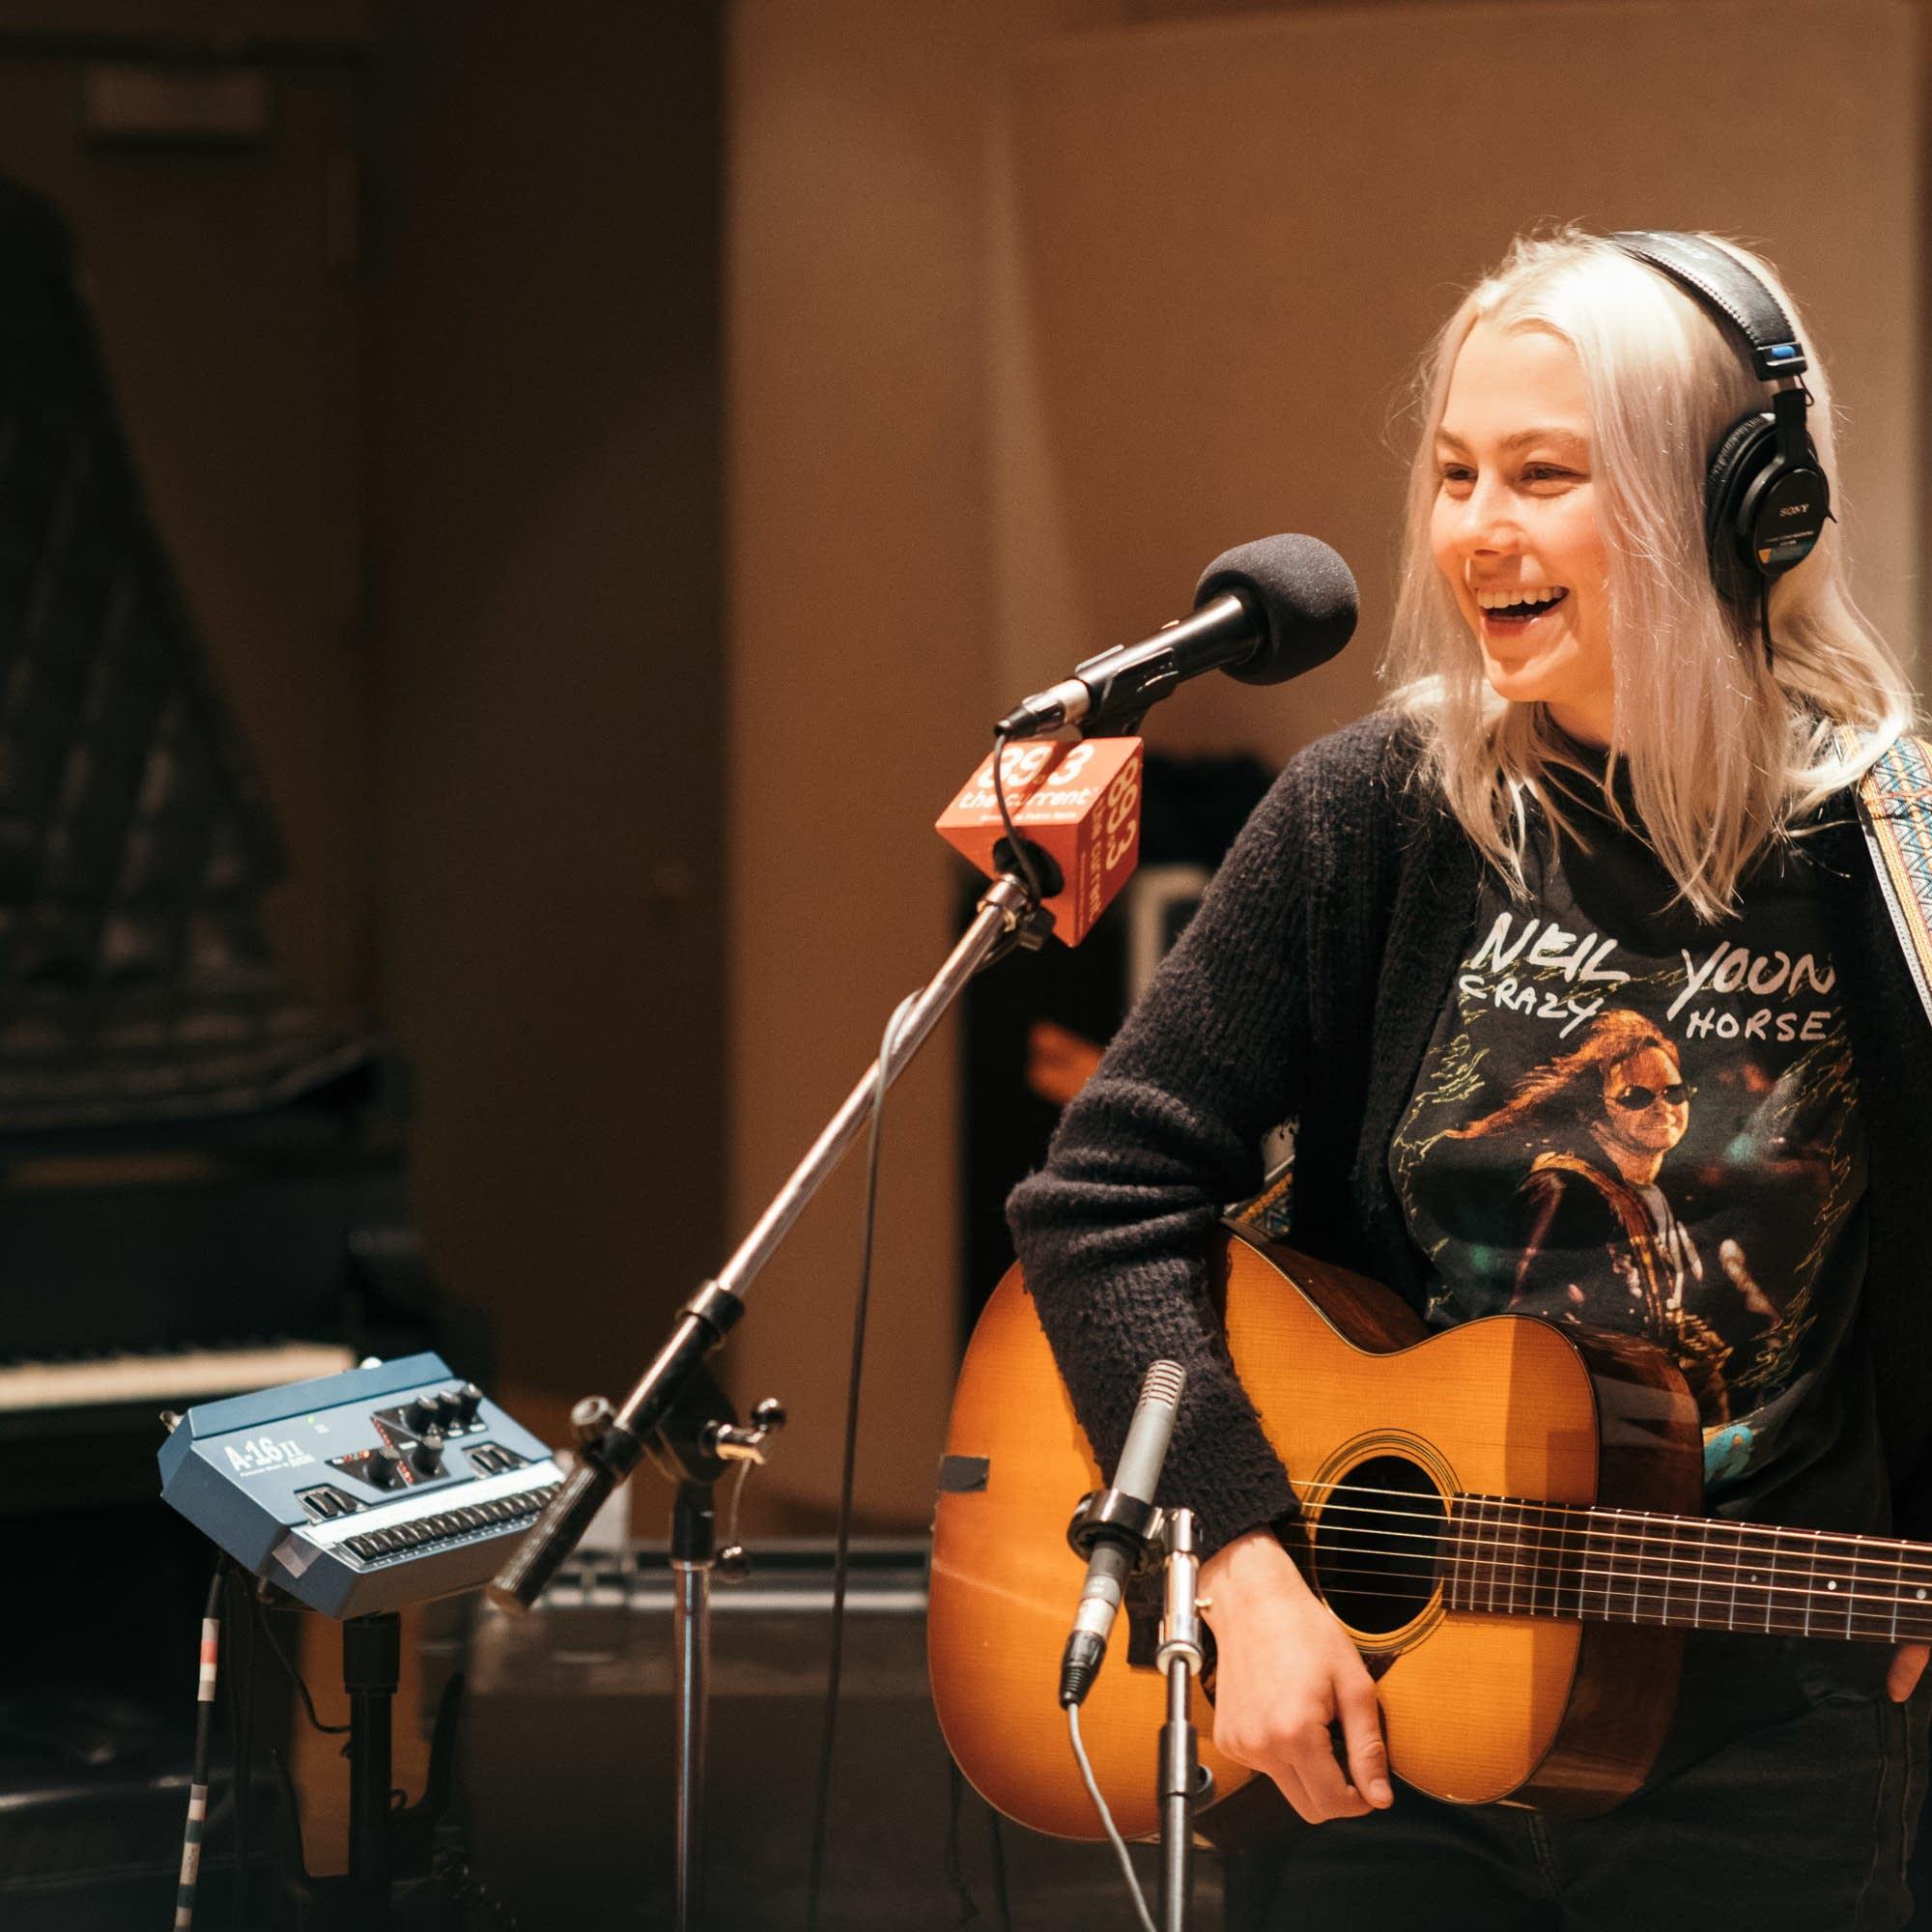 Phoebe Bridgers performs in The Current studio